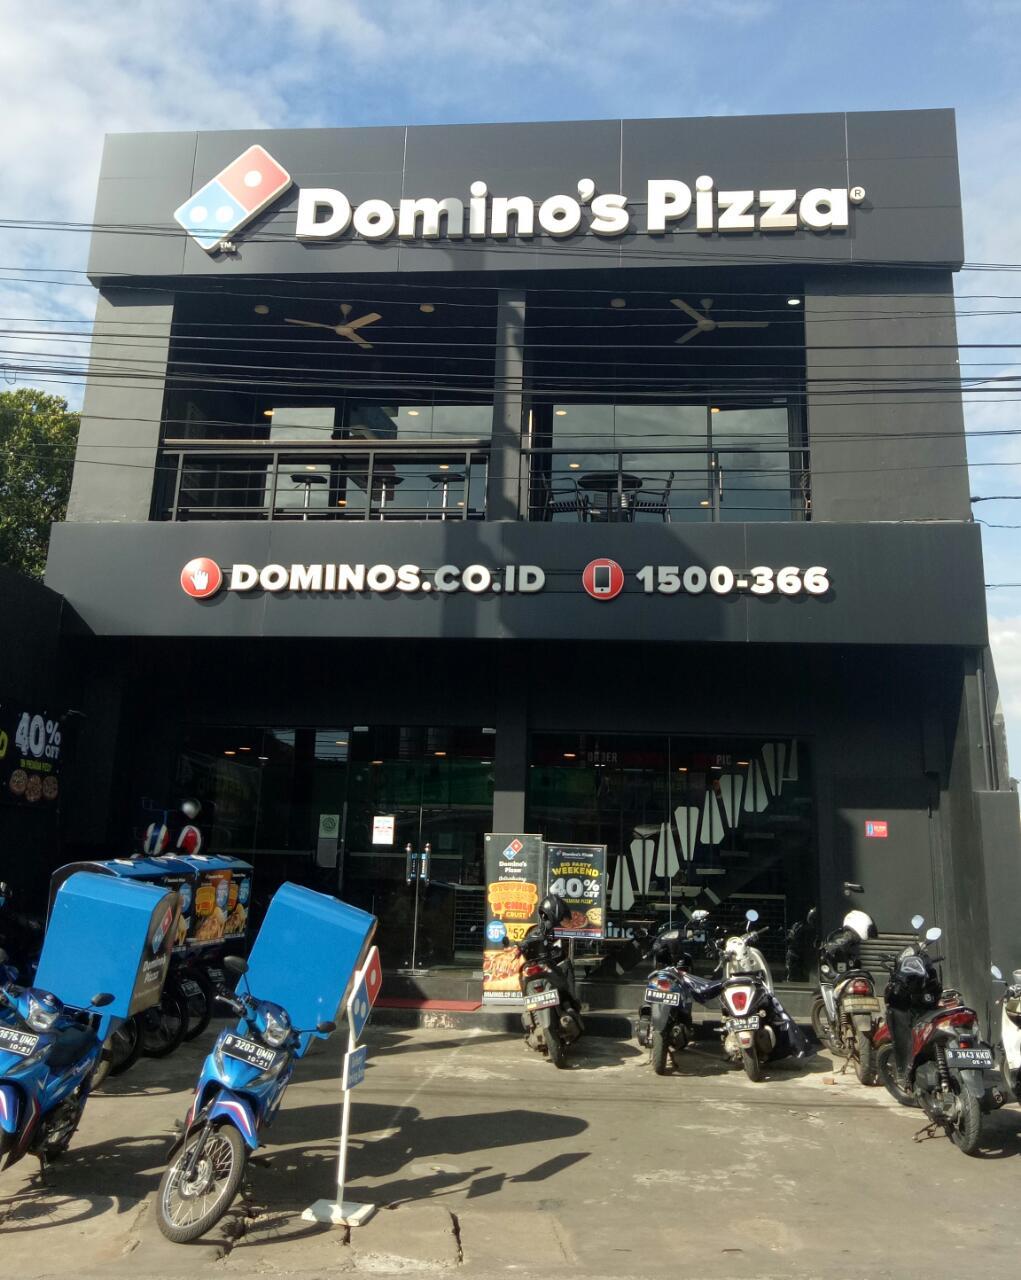 Domino's Pizza - Kel Bintara, Bekasi